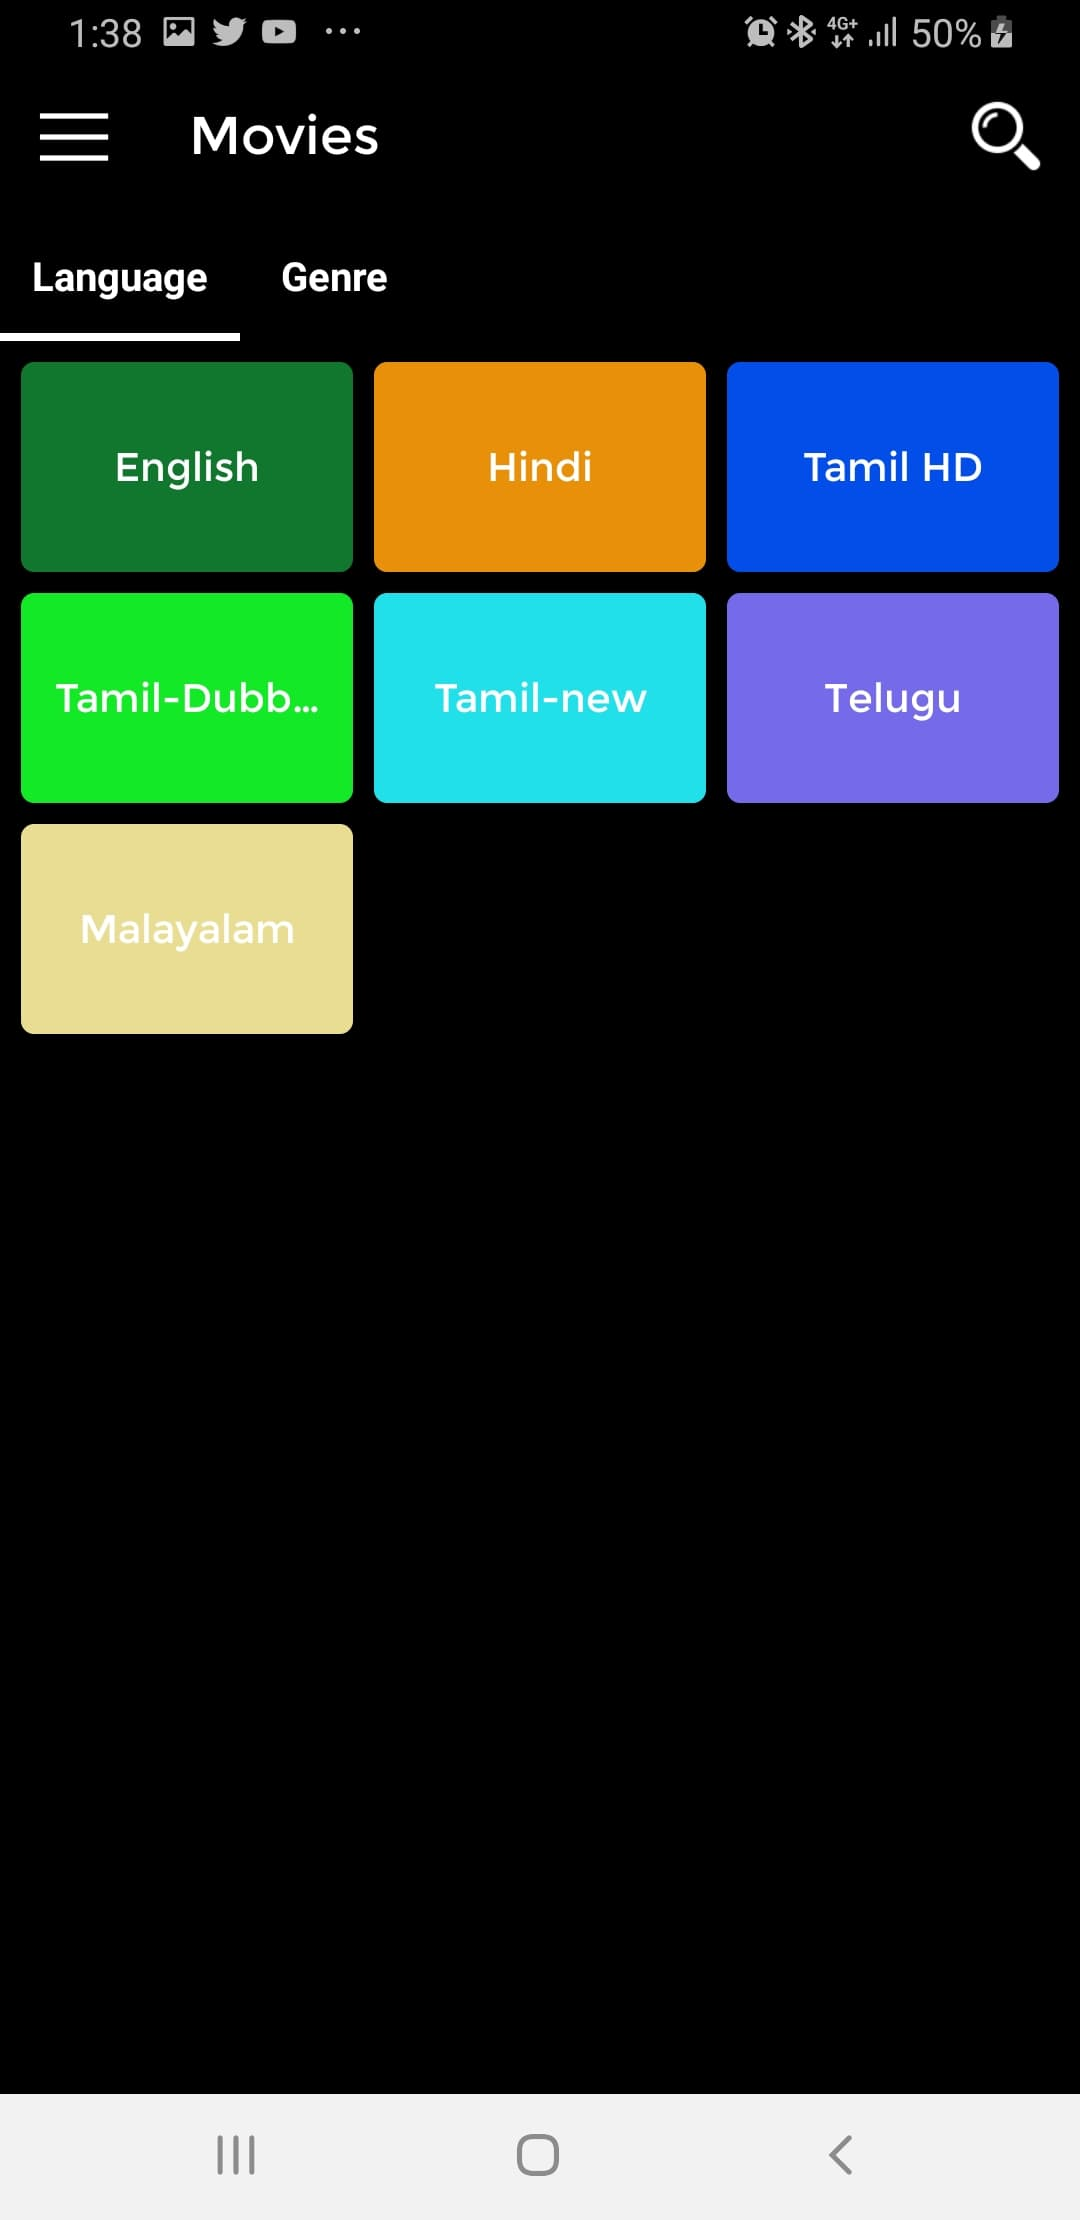 KingoTV Categories